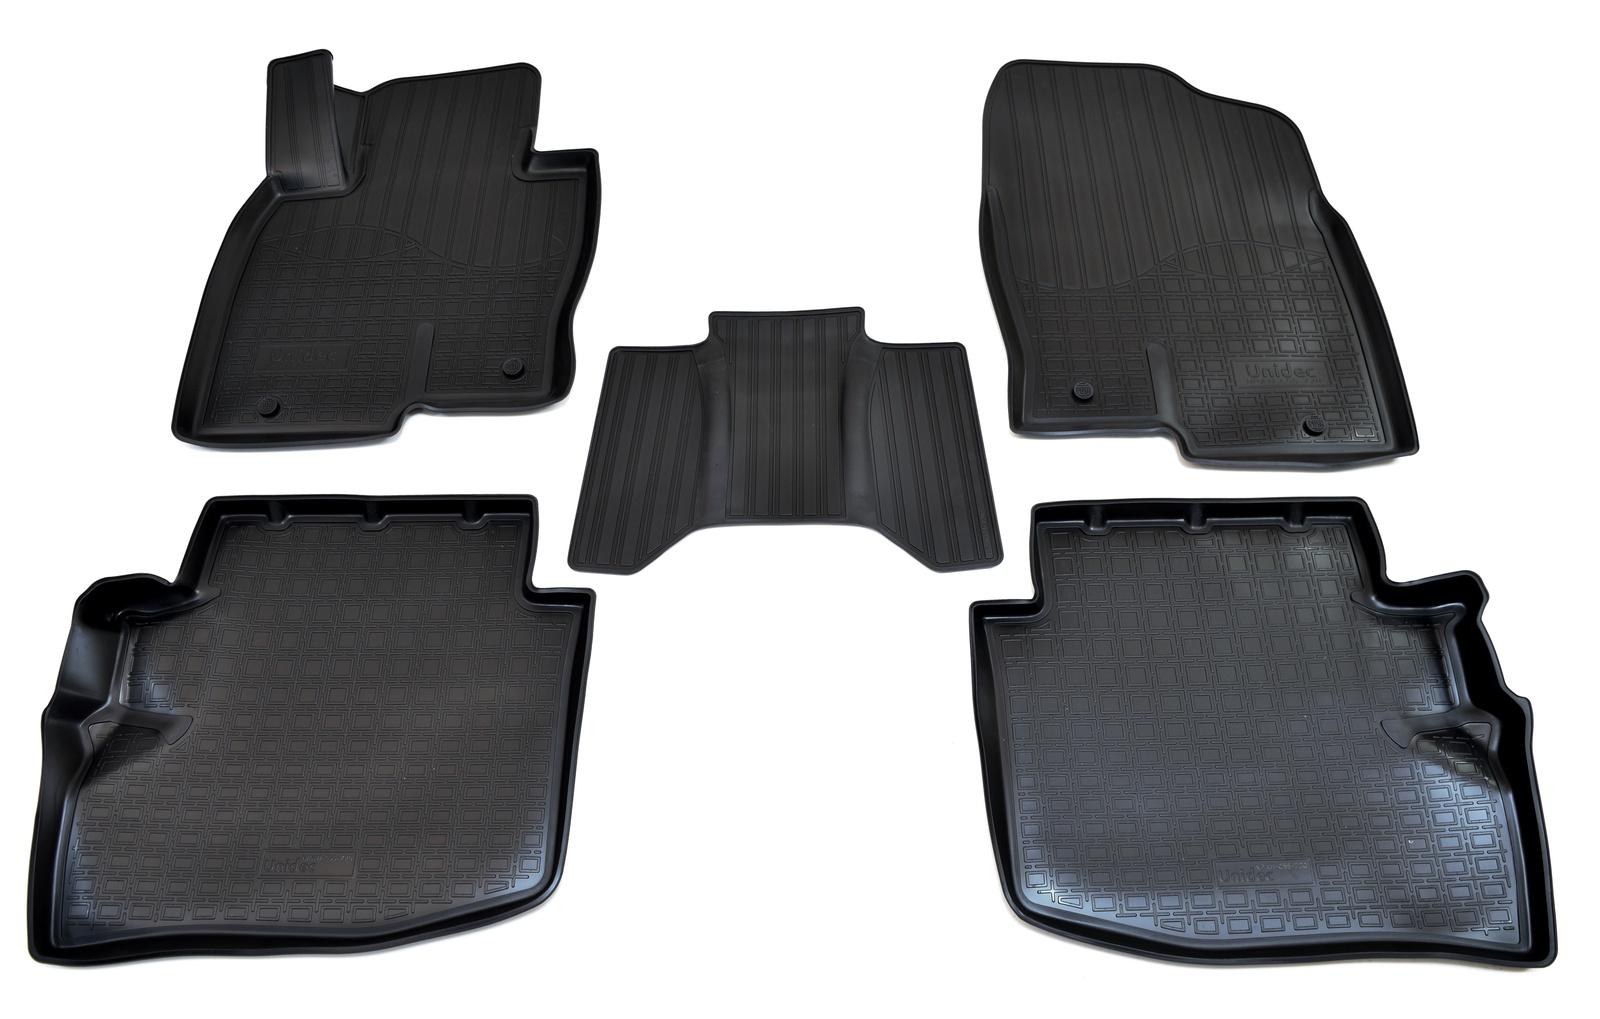 Коврики в салон автомобиля Norplast для Mazda CX-9 II 3D (2017), NPA11-C55-720, черный коврики салона передние резиновые 0000 8b n34 для mazda cx 9 2017